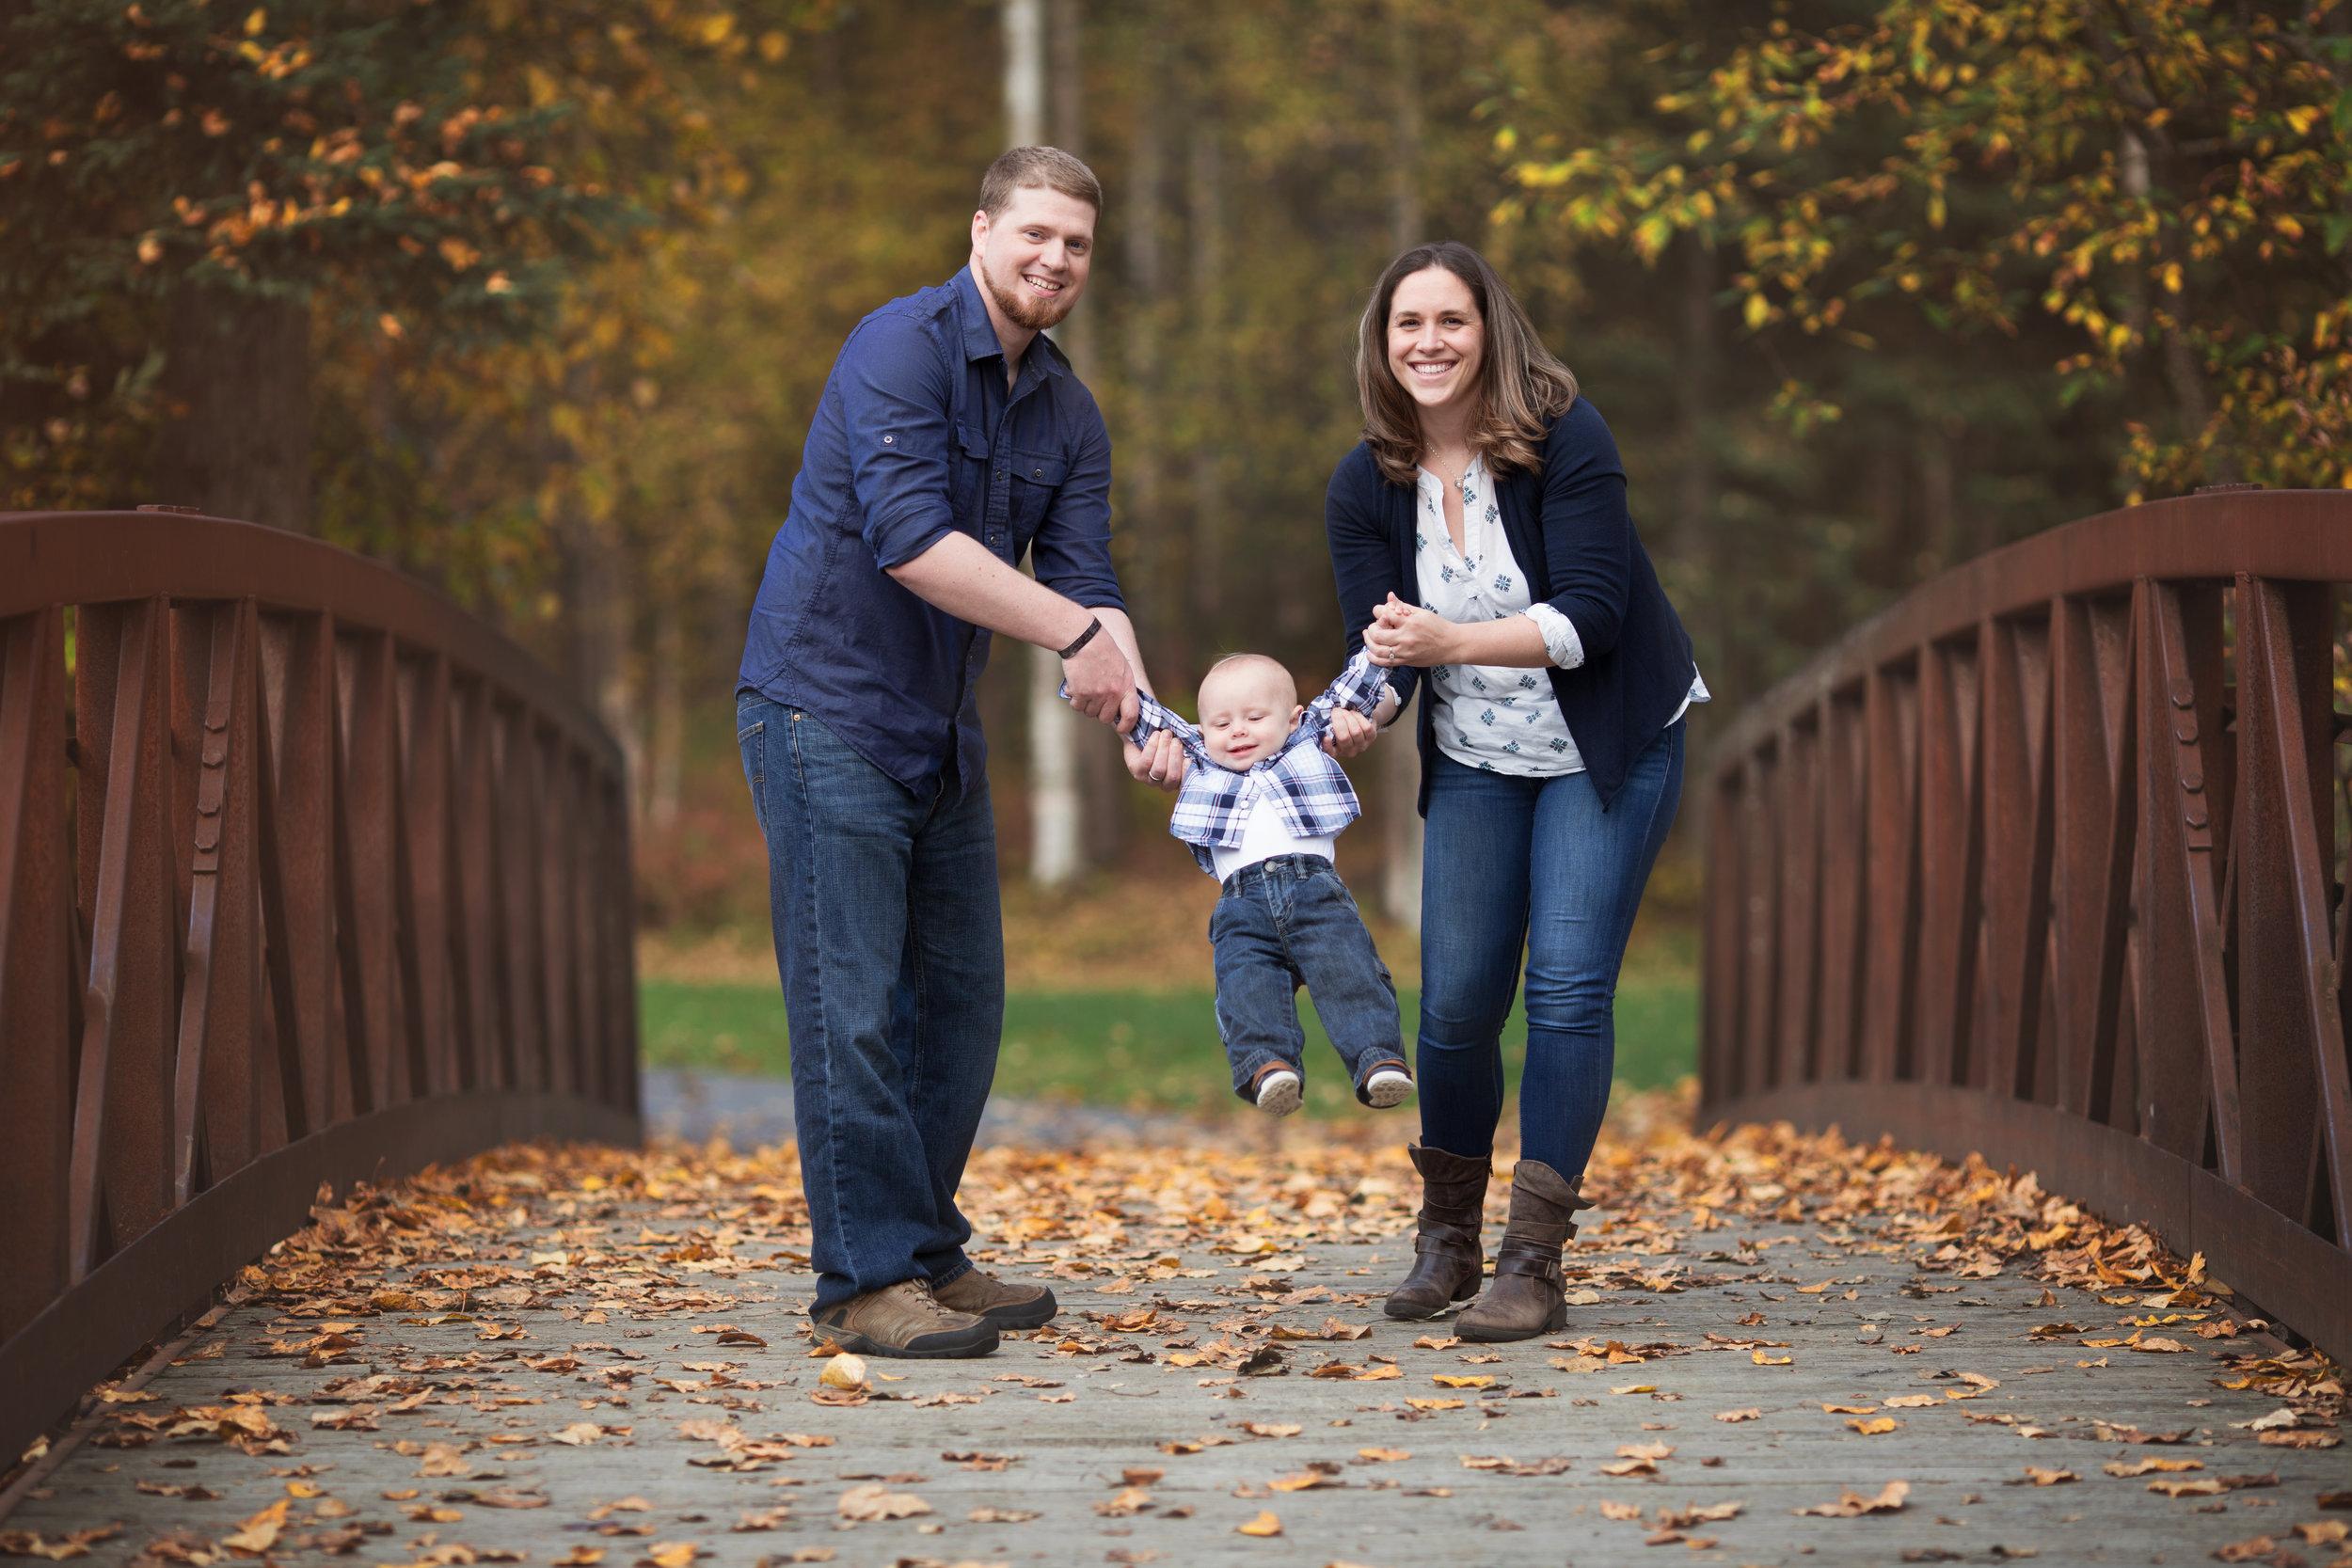 anchorage-family-photographer-5.jpg